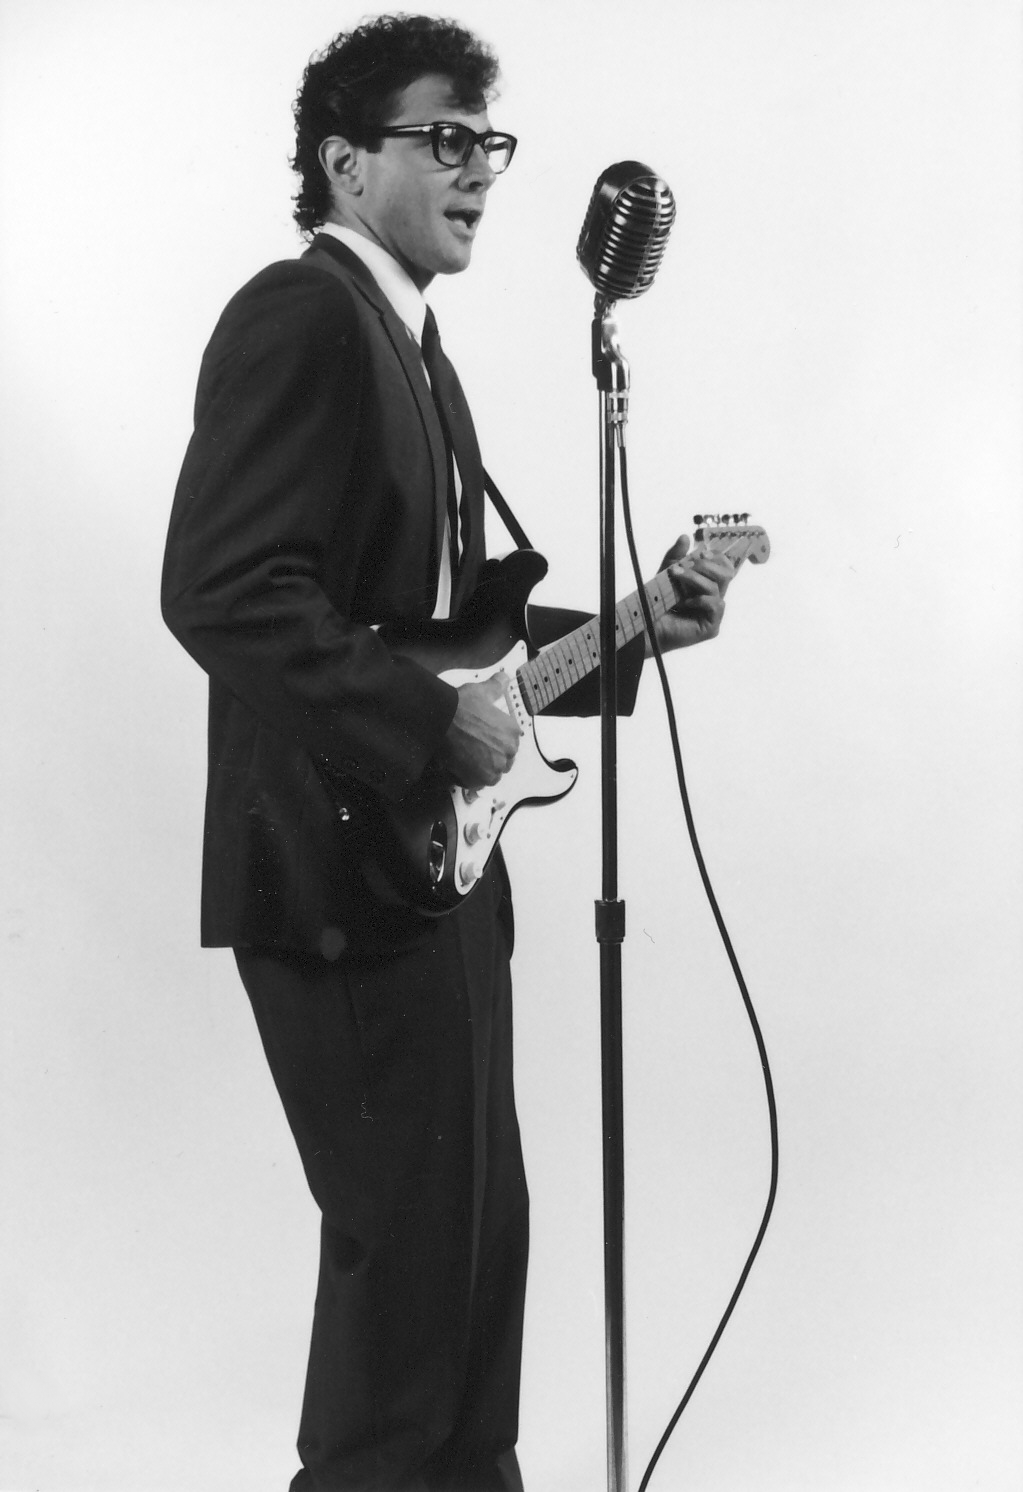 JS as Buddy Holly